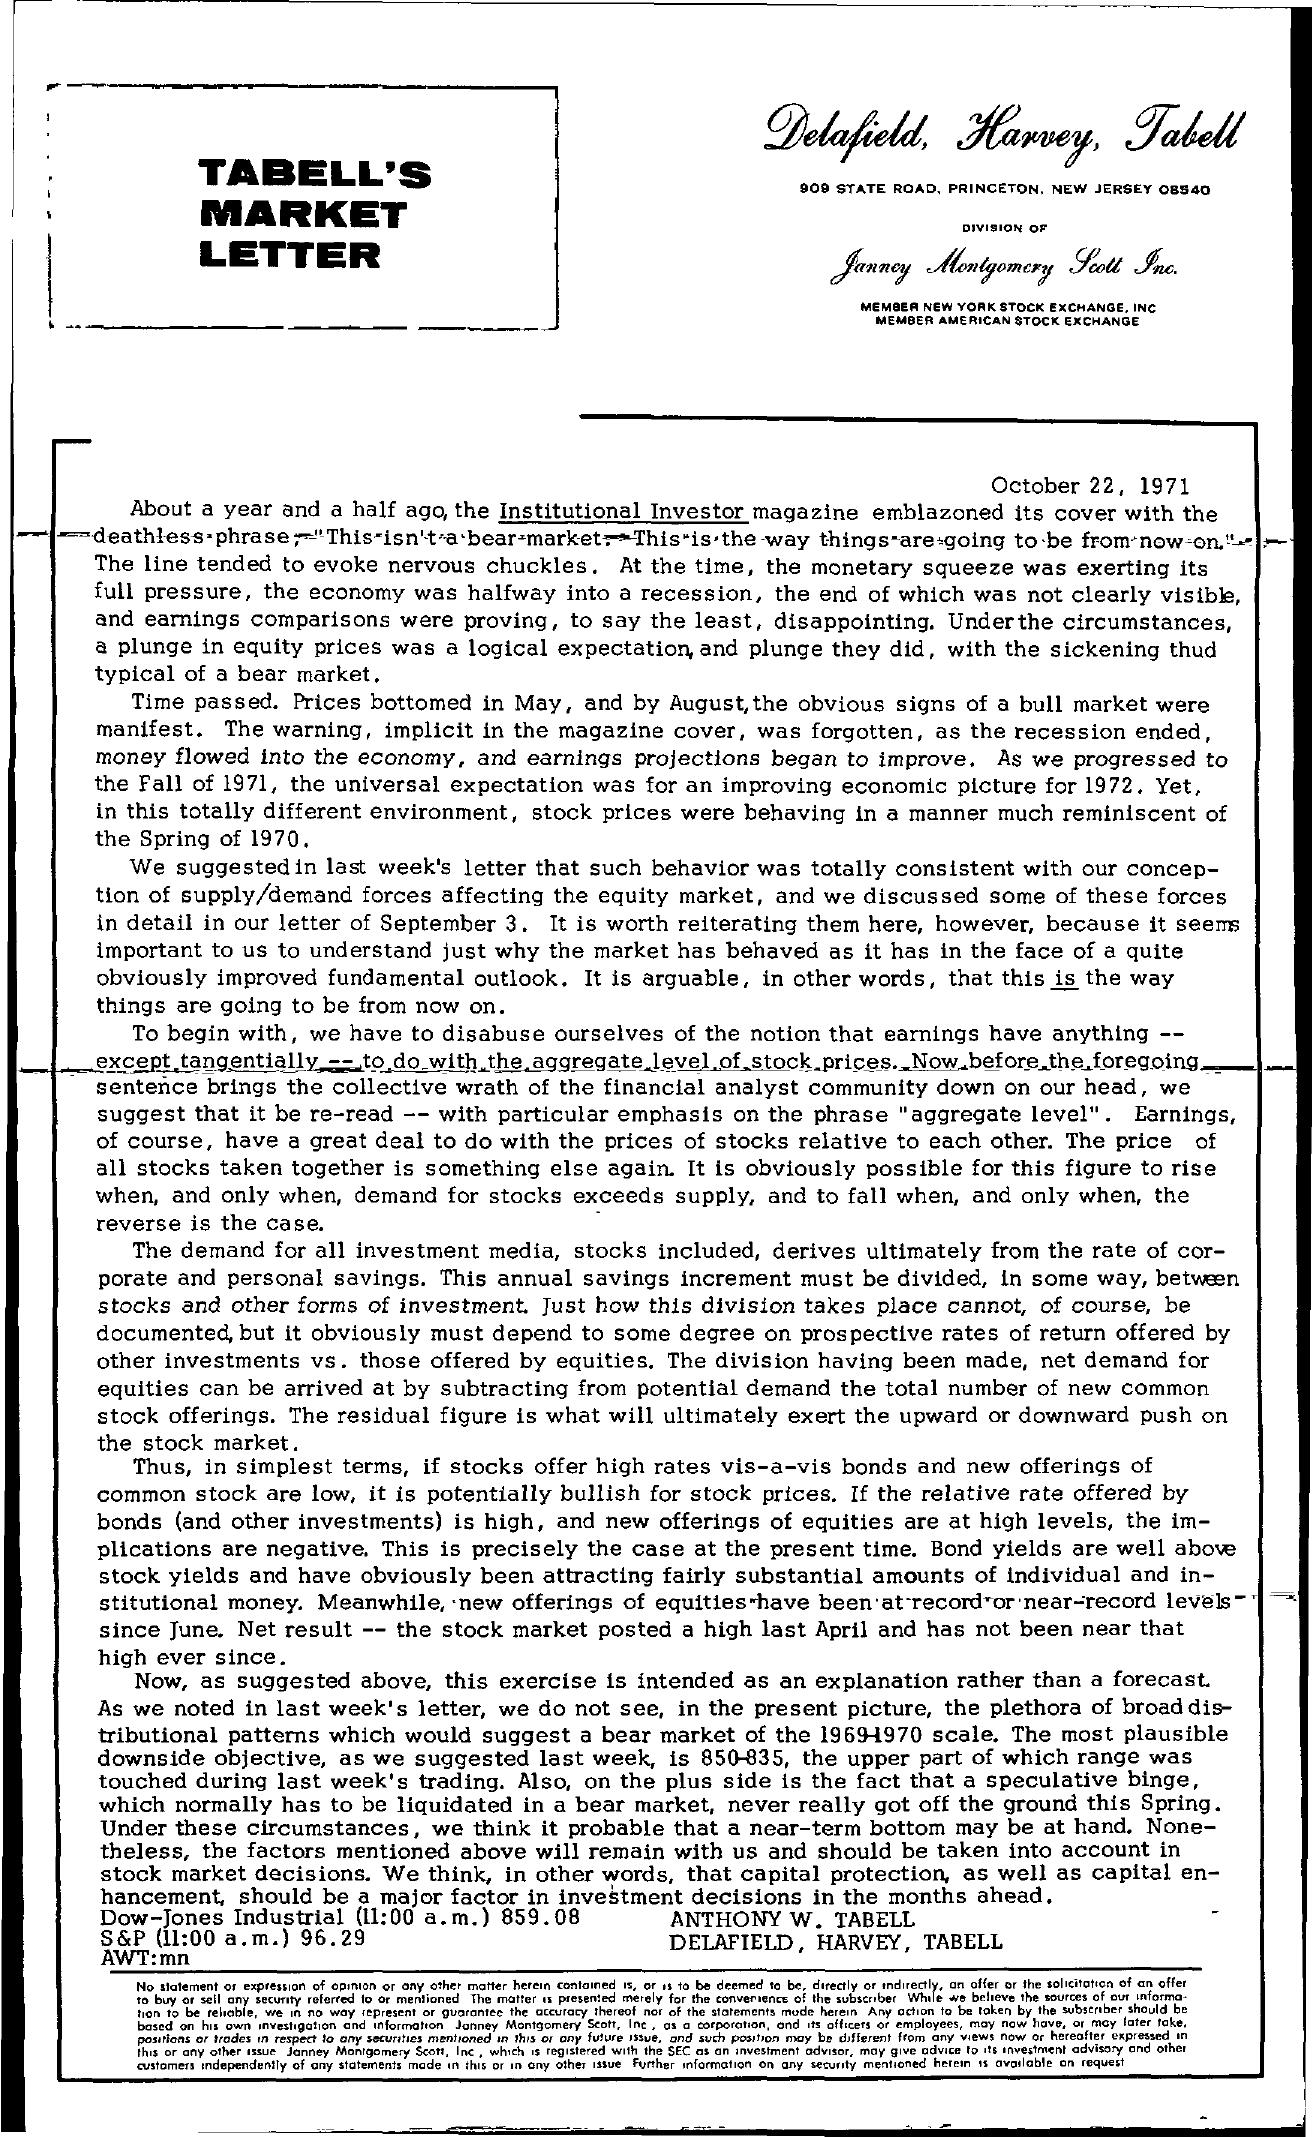 Tabell's Market Letter - October 22, 1971